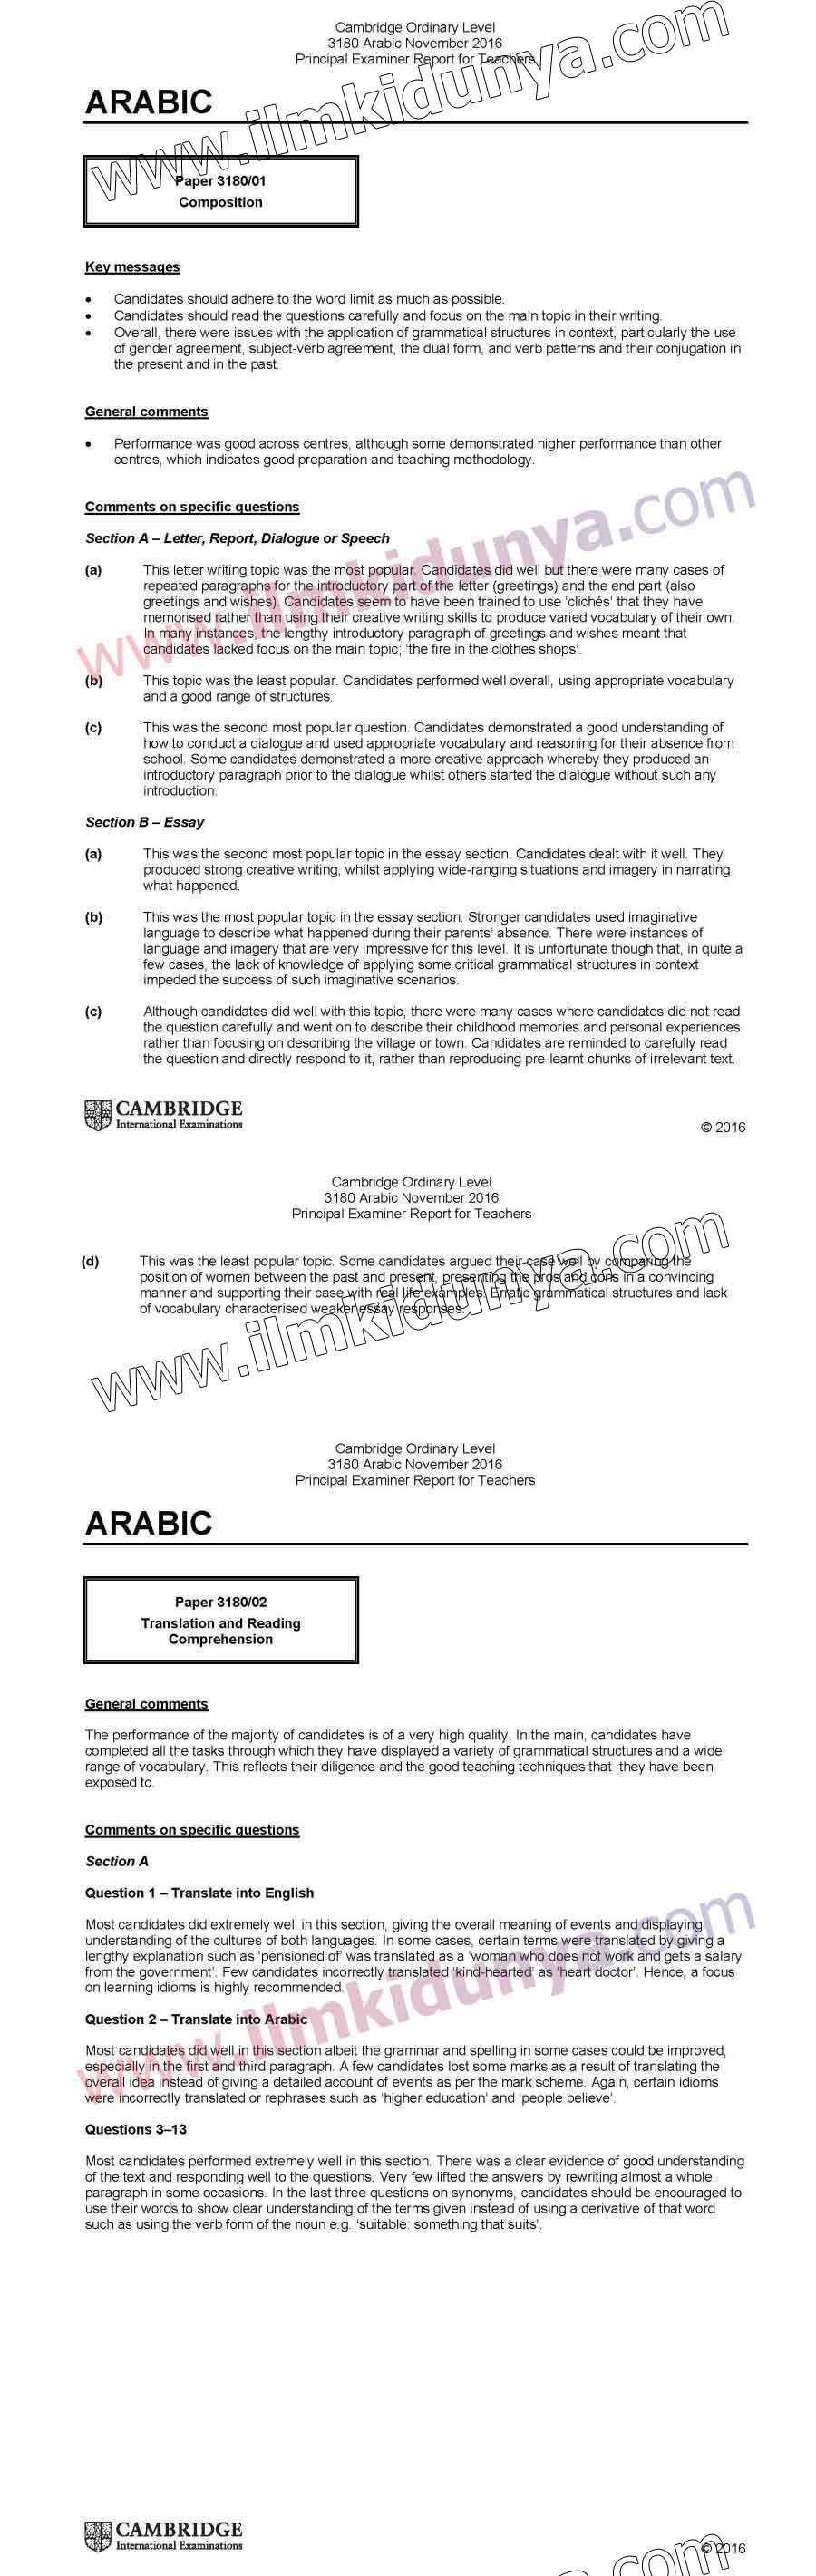 Past Paper 2016 CIE Cambridge International Examinations O